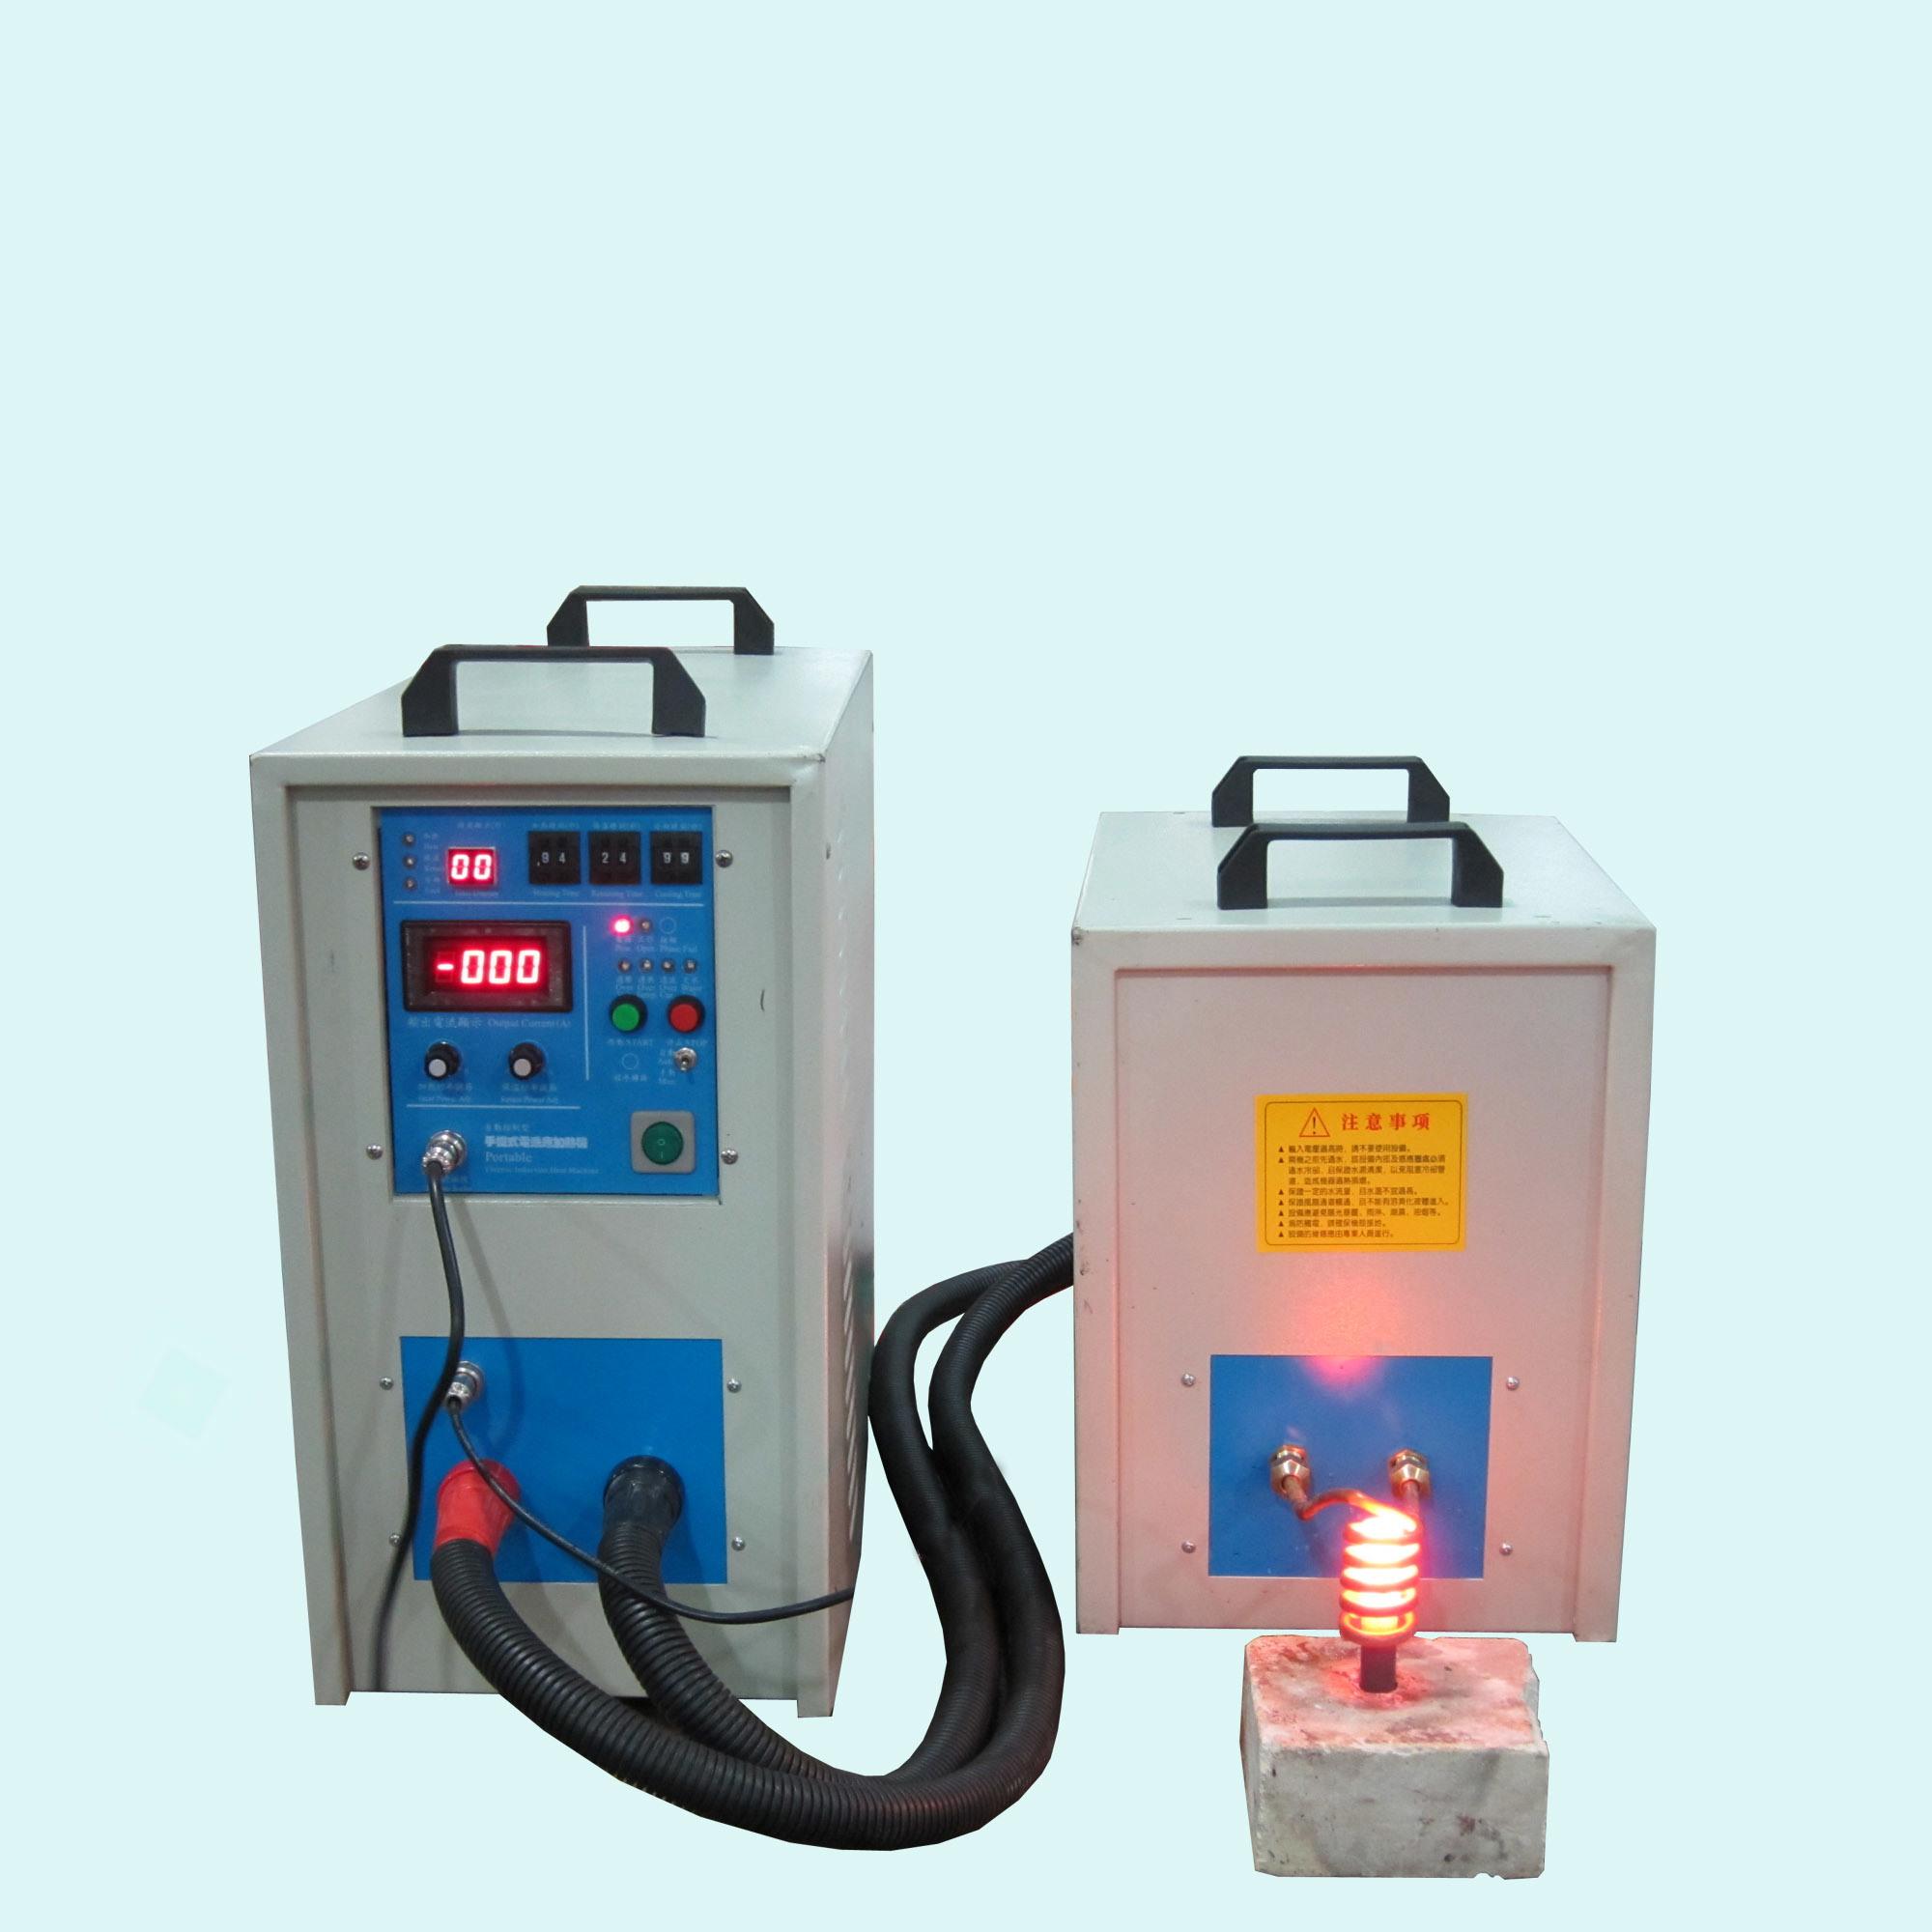 Induction Heating Equipment : China igbt induction heating equipment photos pictures